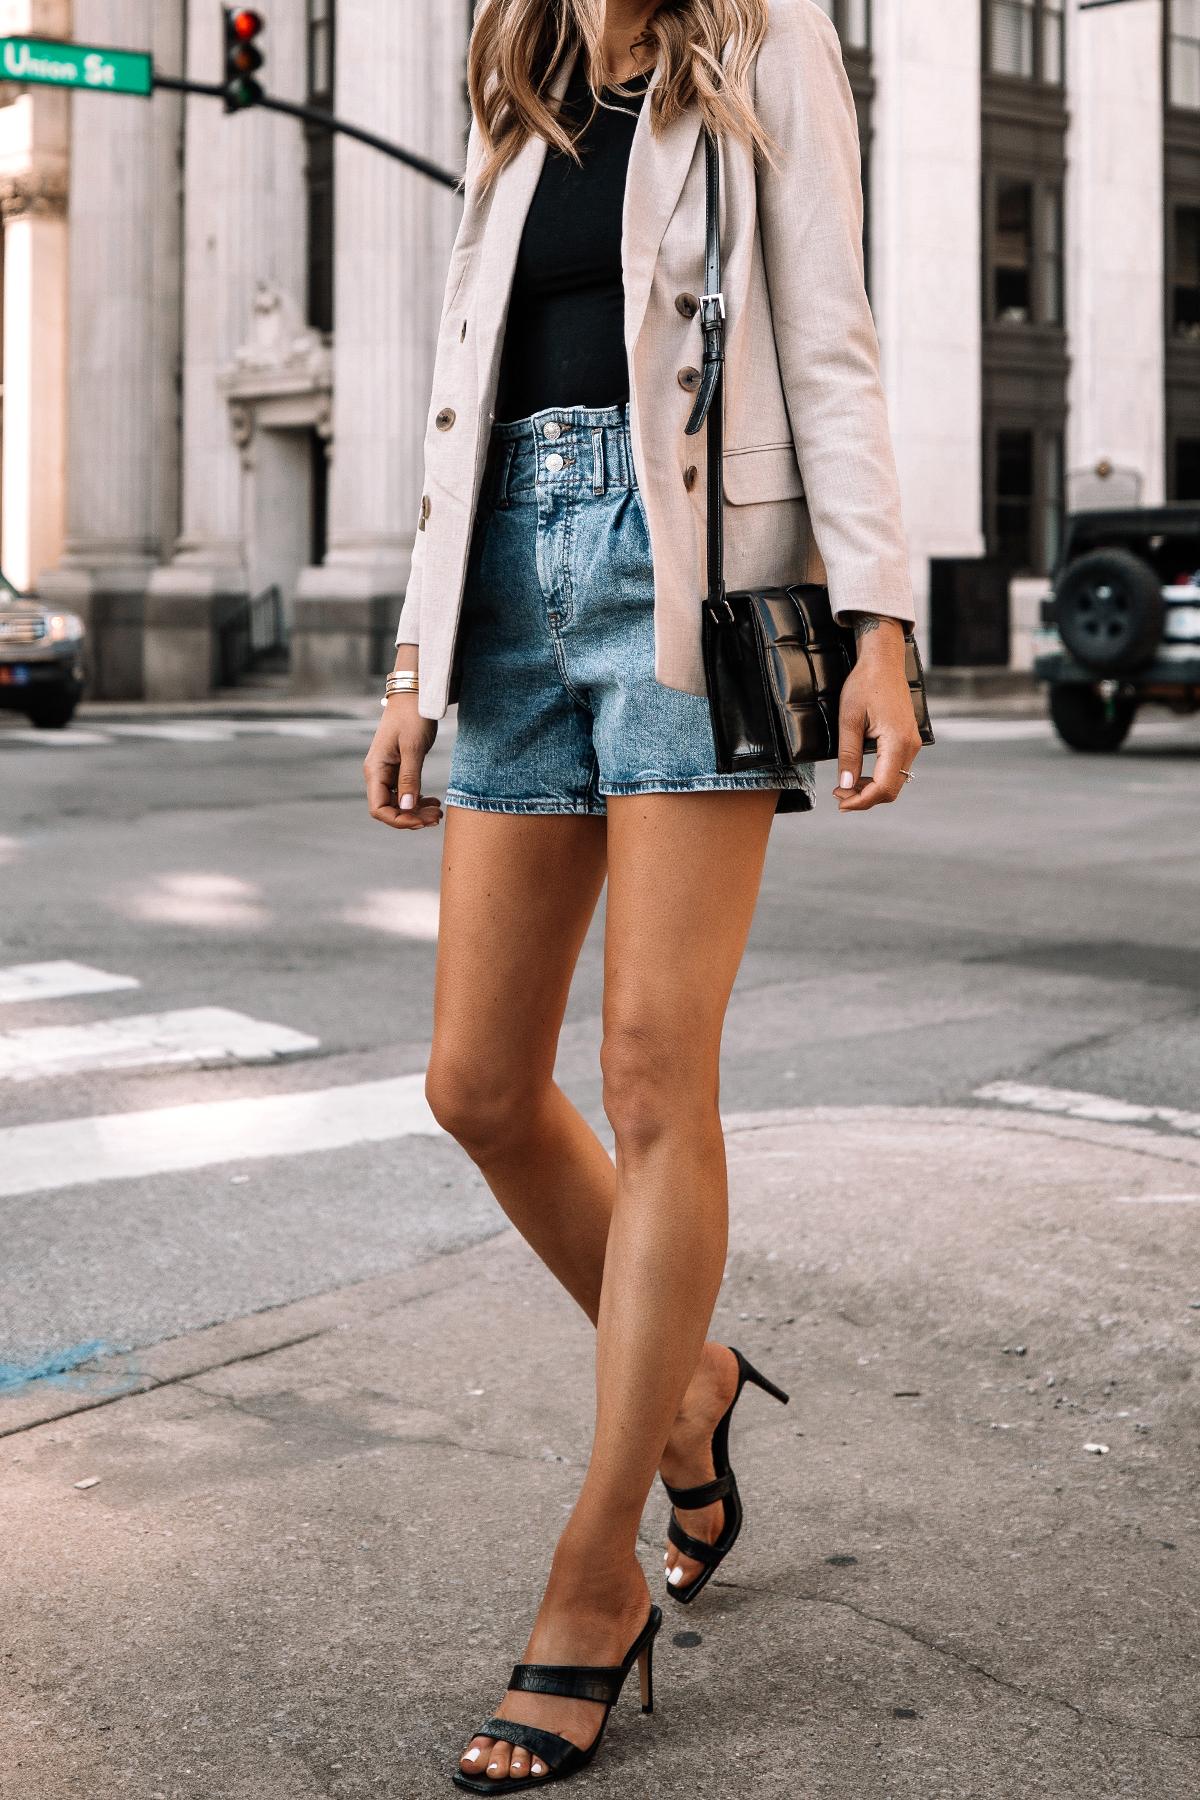 Fashion Jackson Wearing Beige Blazer Denim Shorts Black Heels Spring Outfit